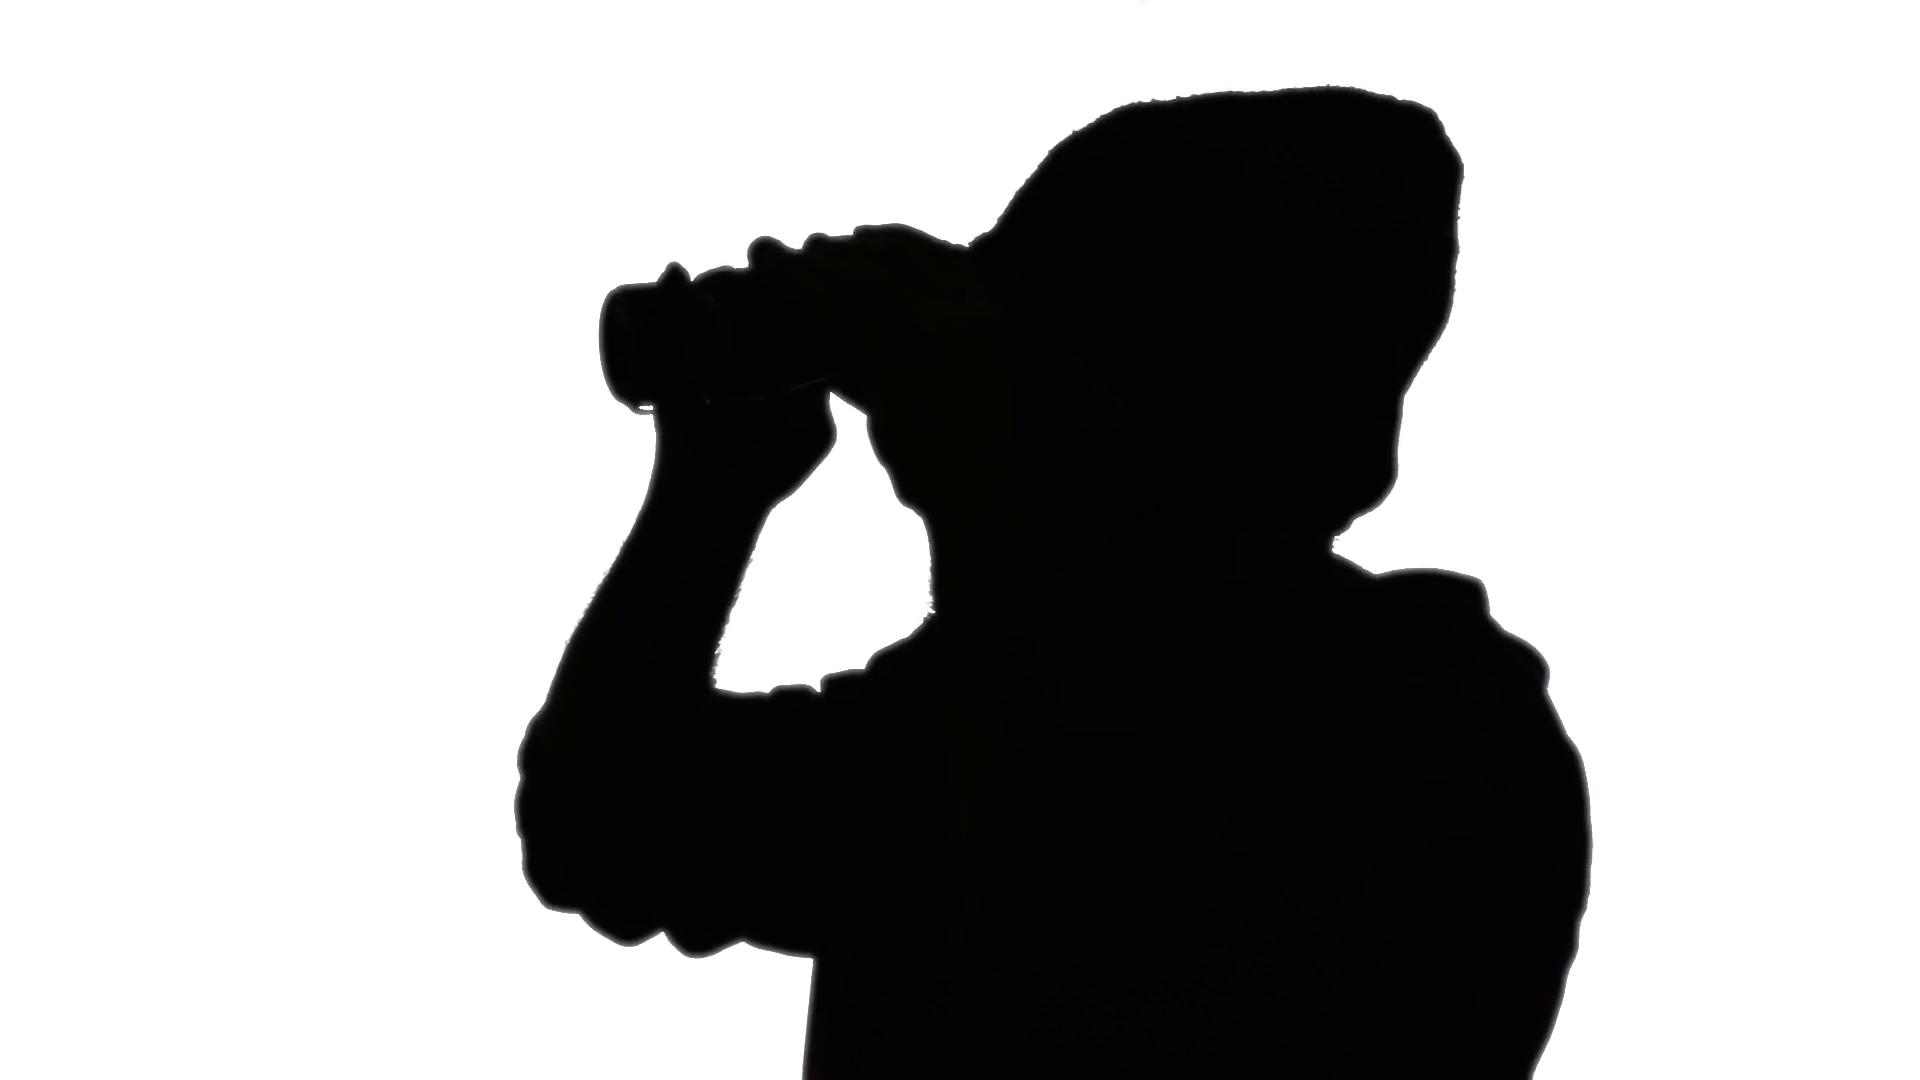 Looking Through Binoculars PNG - 45046